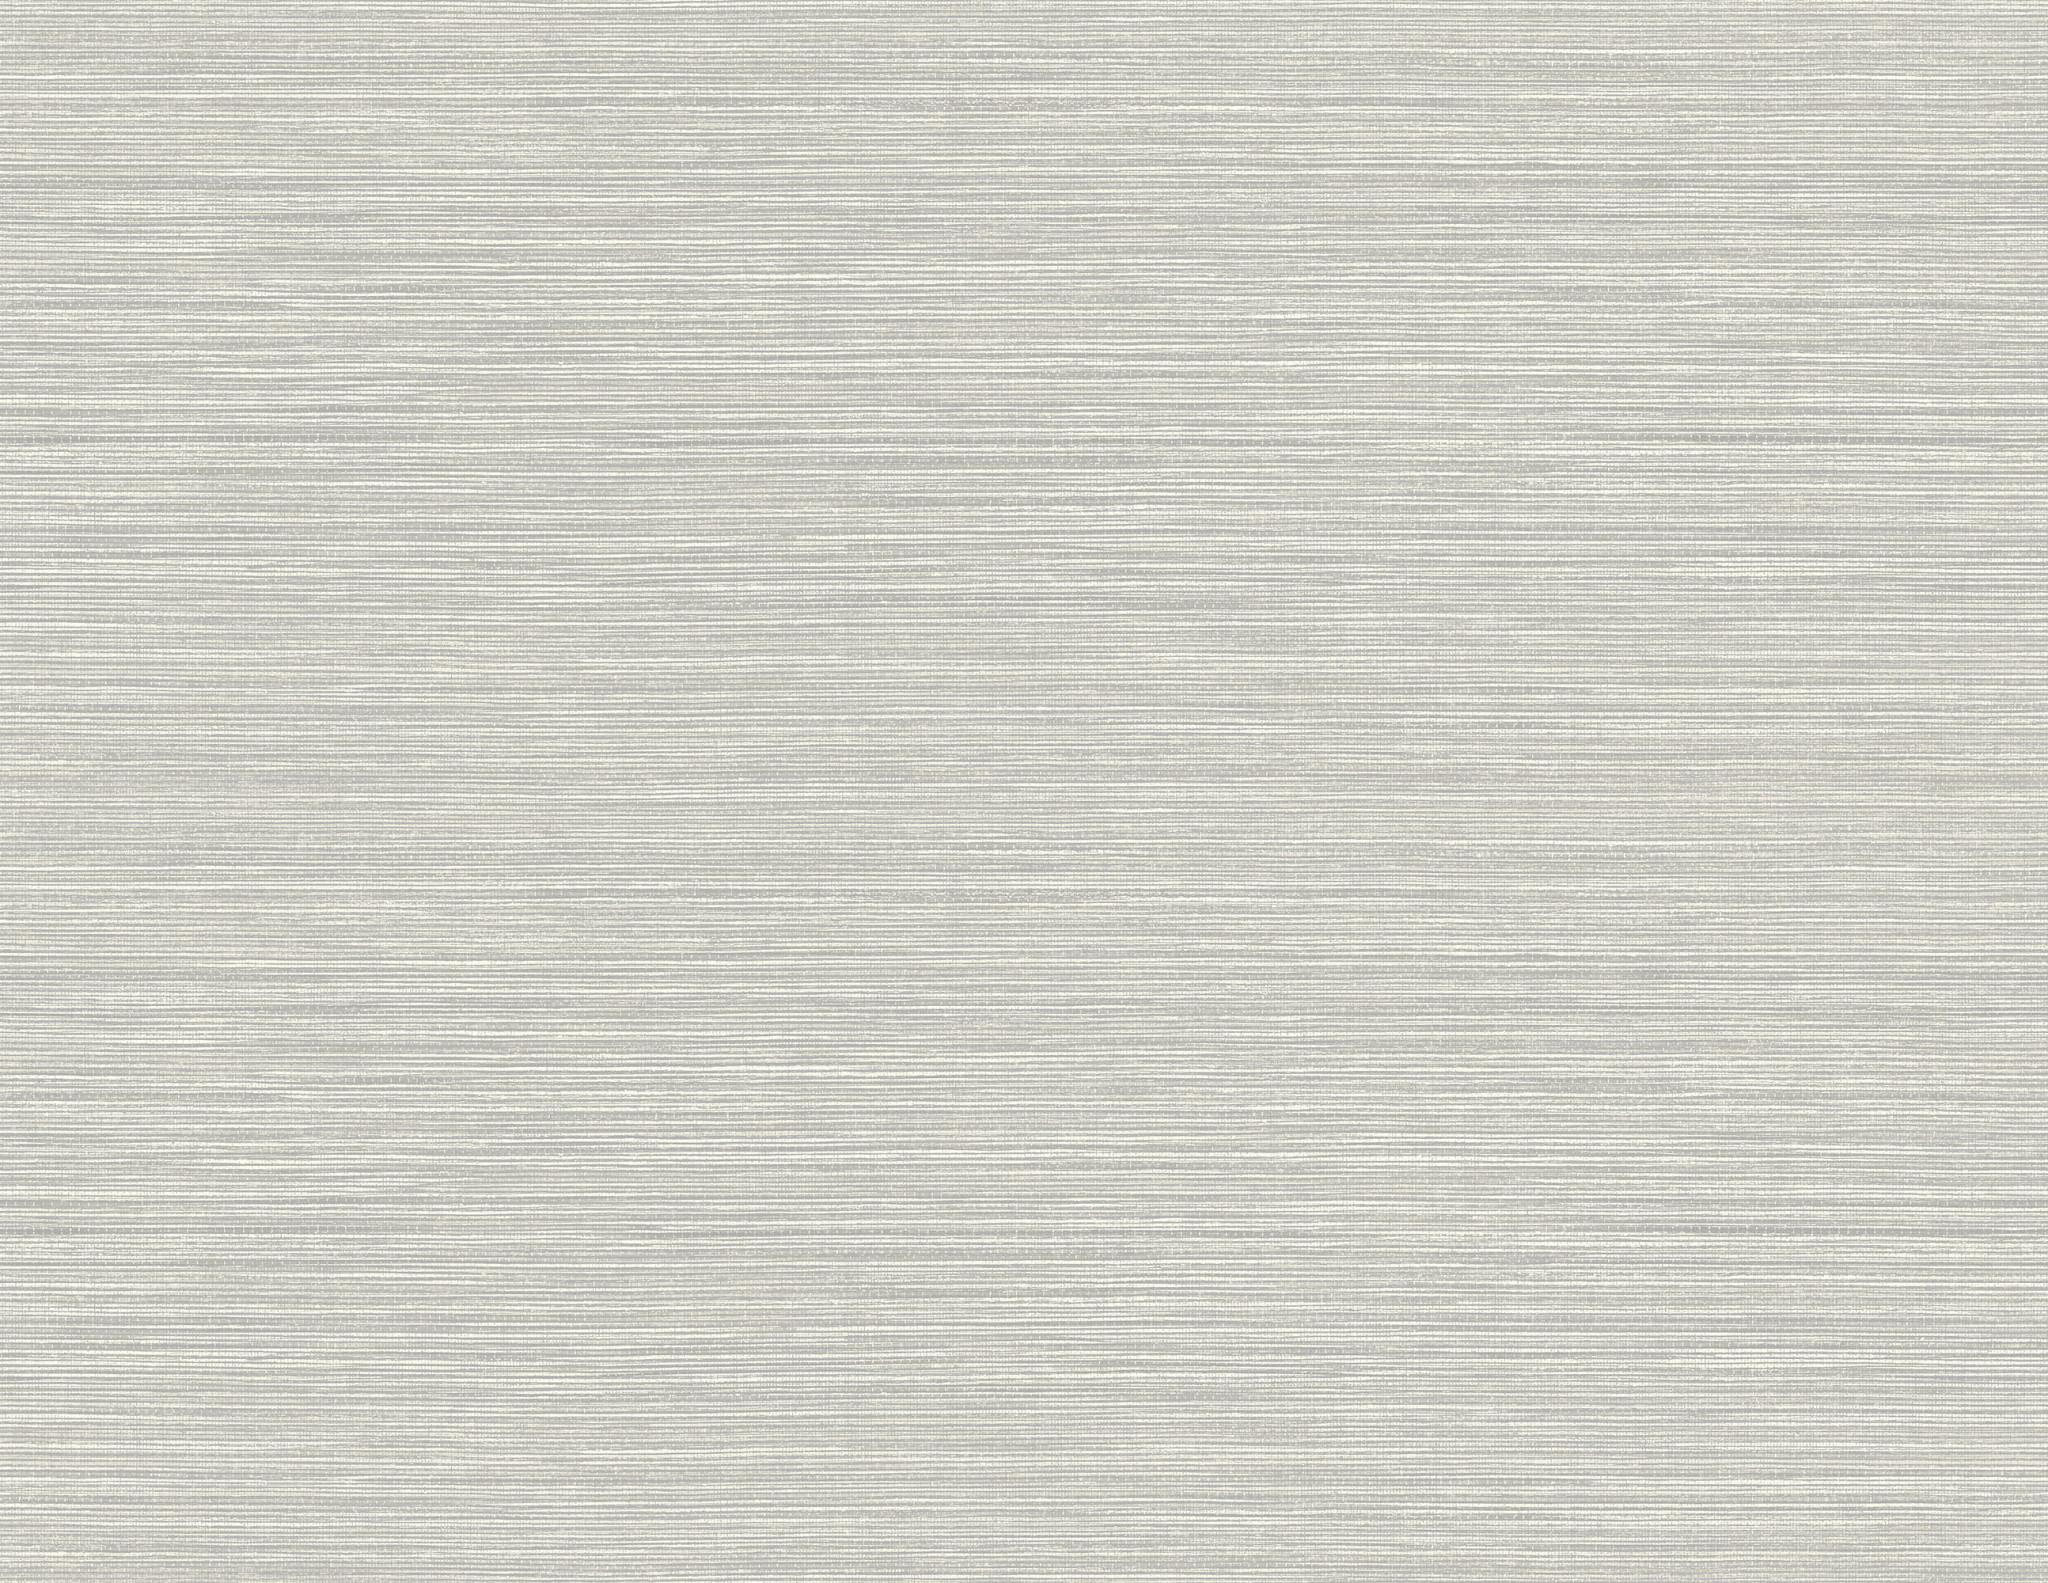 Wallquest Vinyl Grasscloth